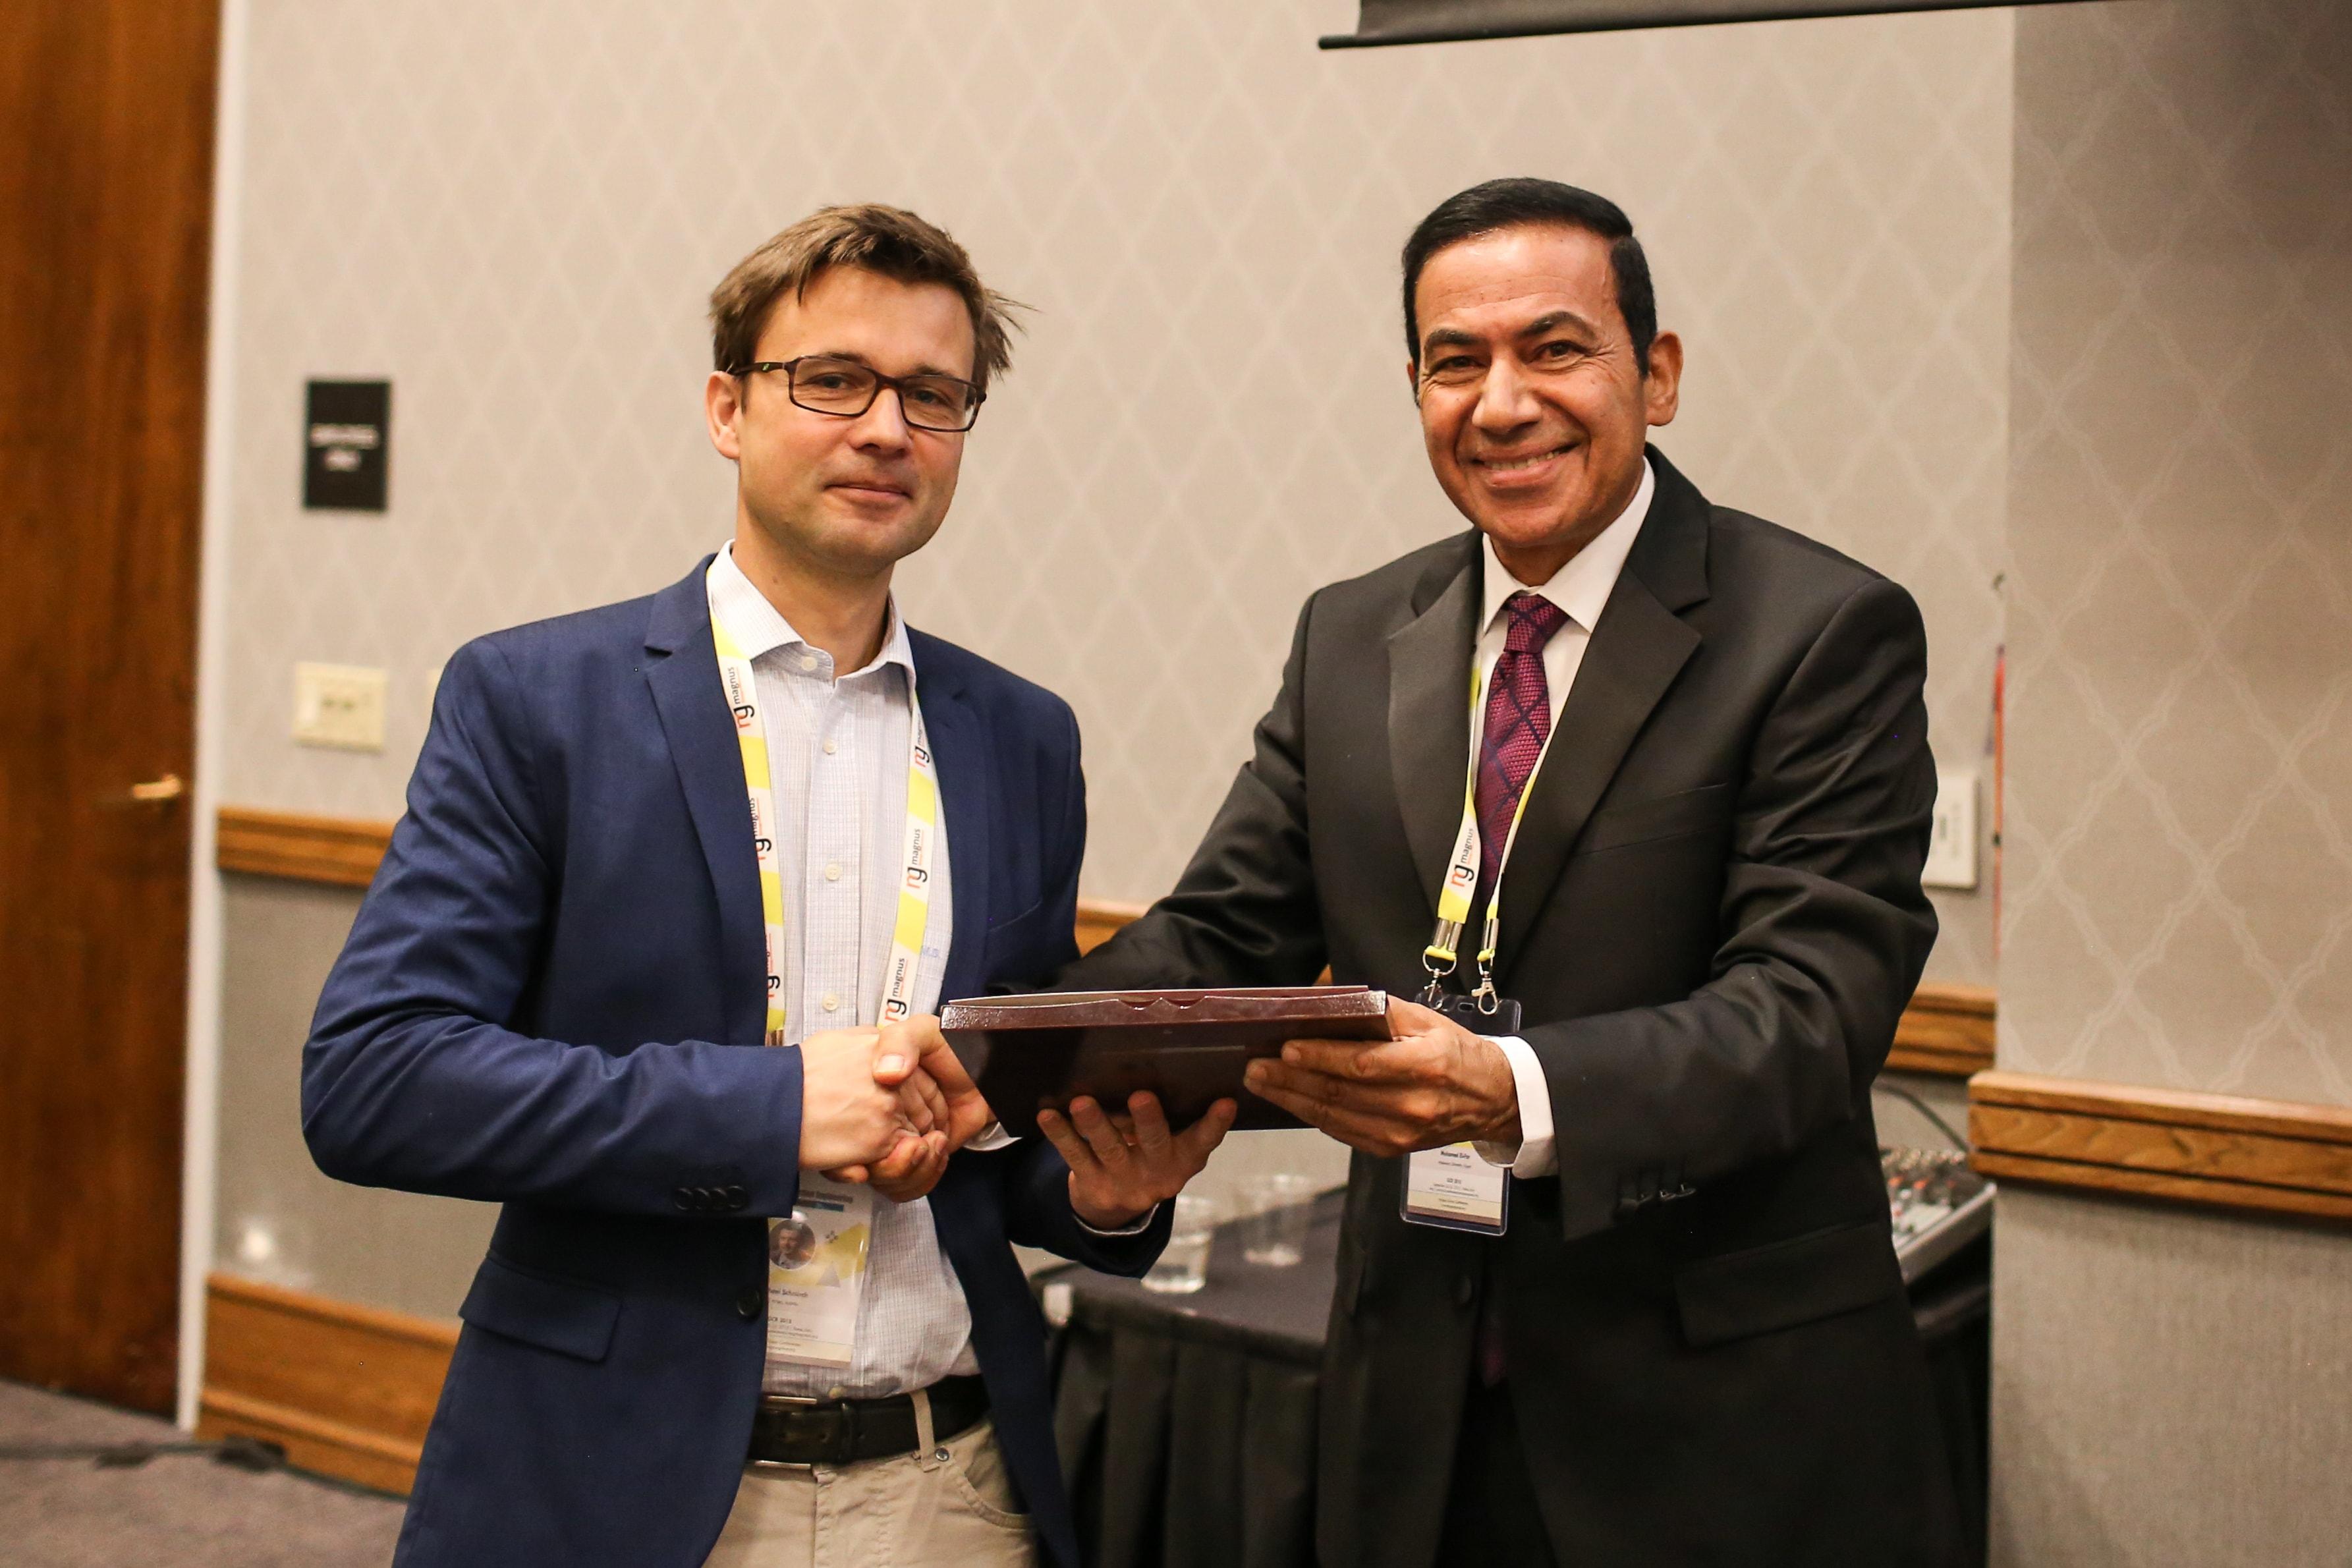 Michael Schnurch felicitated by Mohamed El-Far